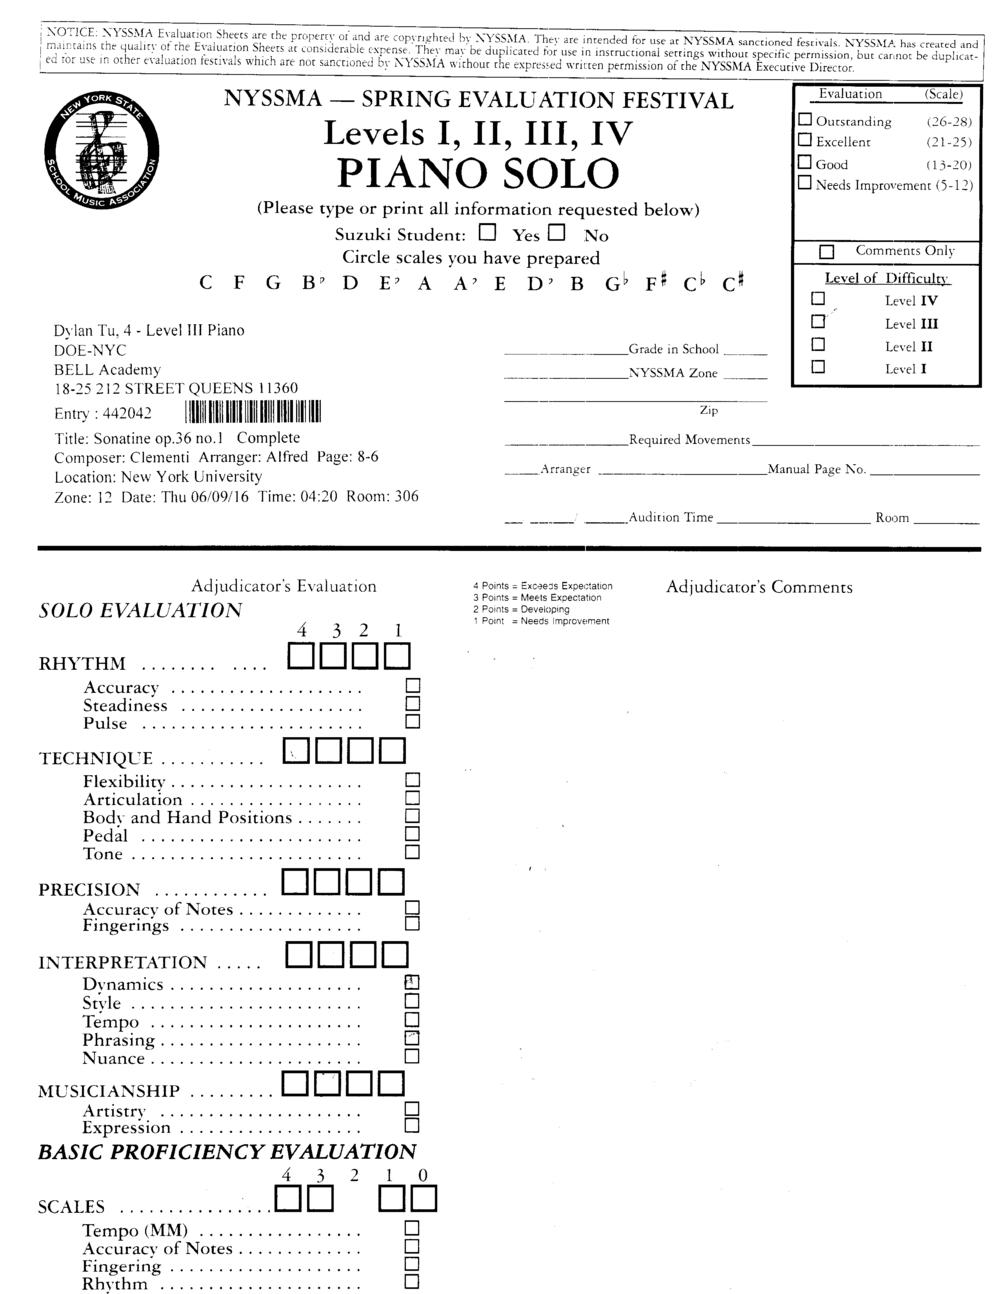 Dylan Tu Piano.png